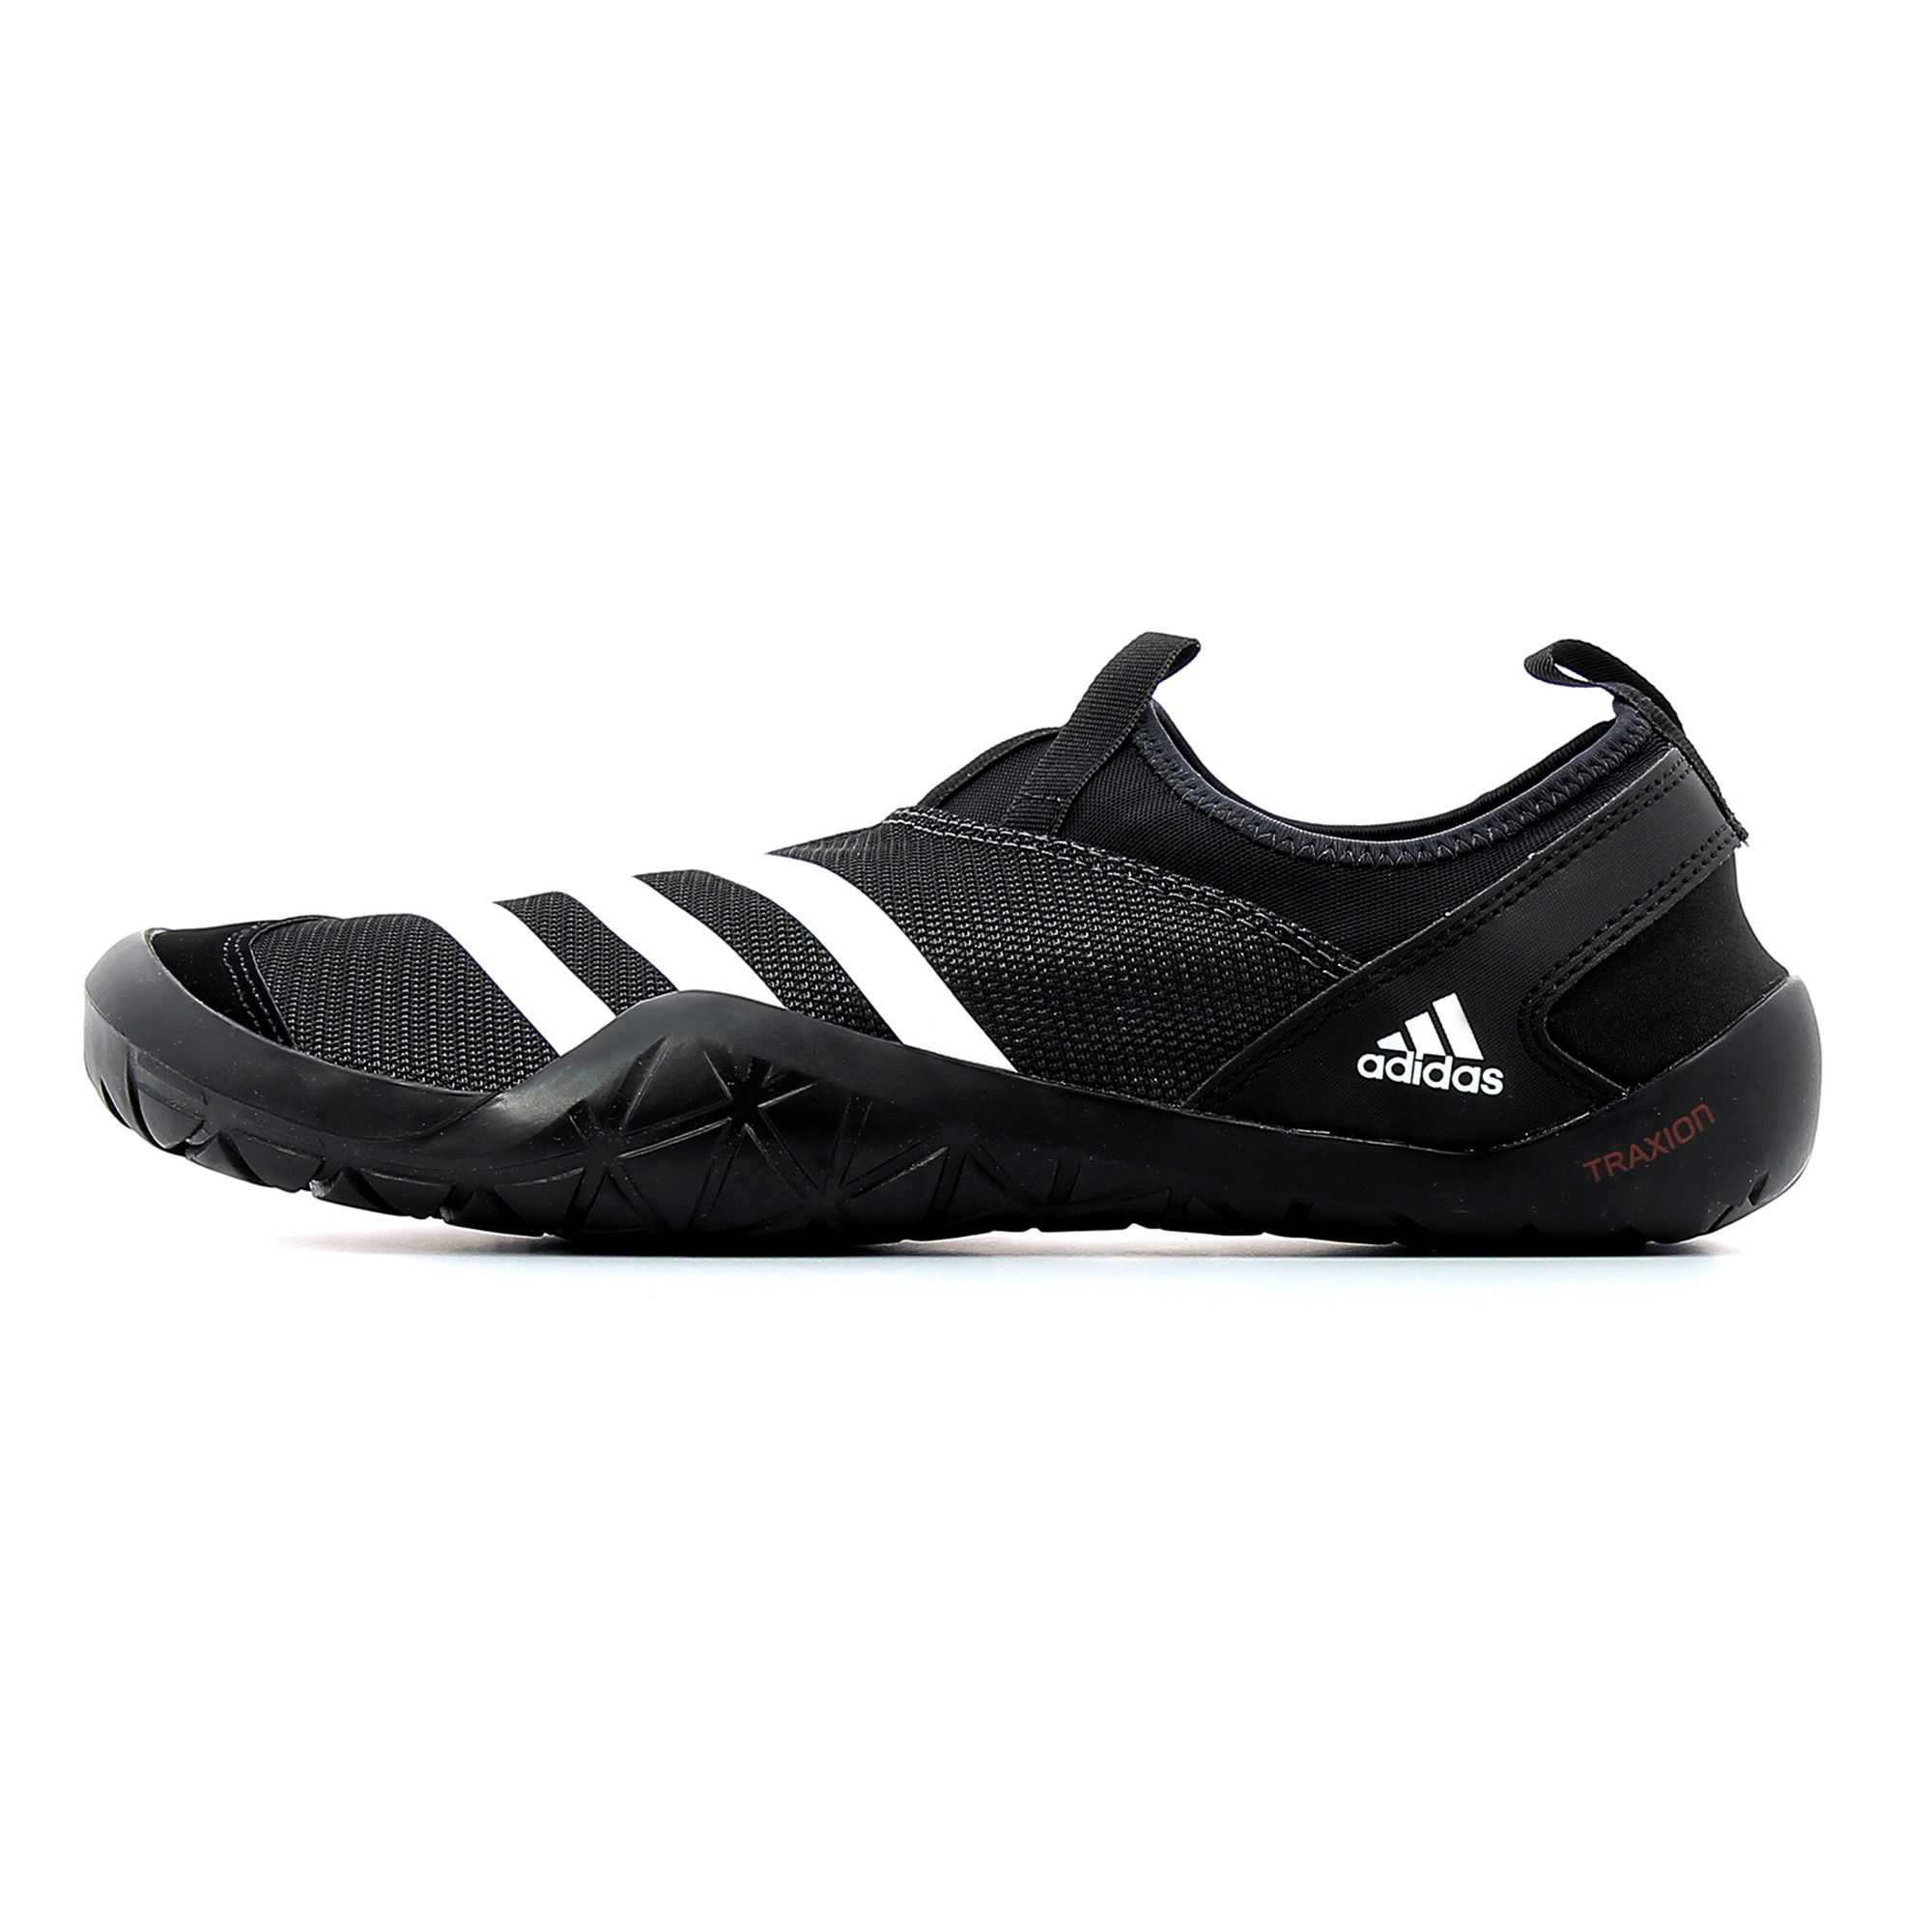 Cher Adidas Jawpaw Sl Pas Noir Climacool Homme Sandales q7FPW1xU4